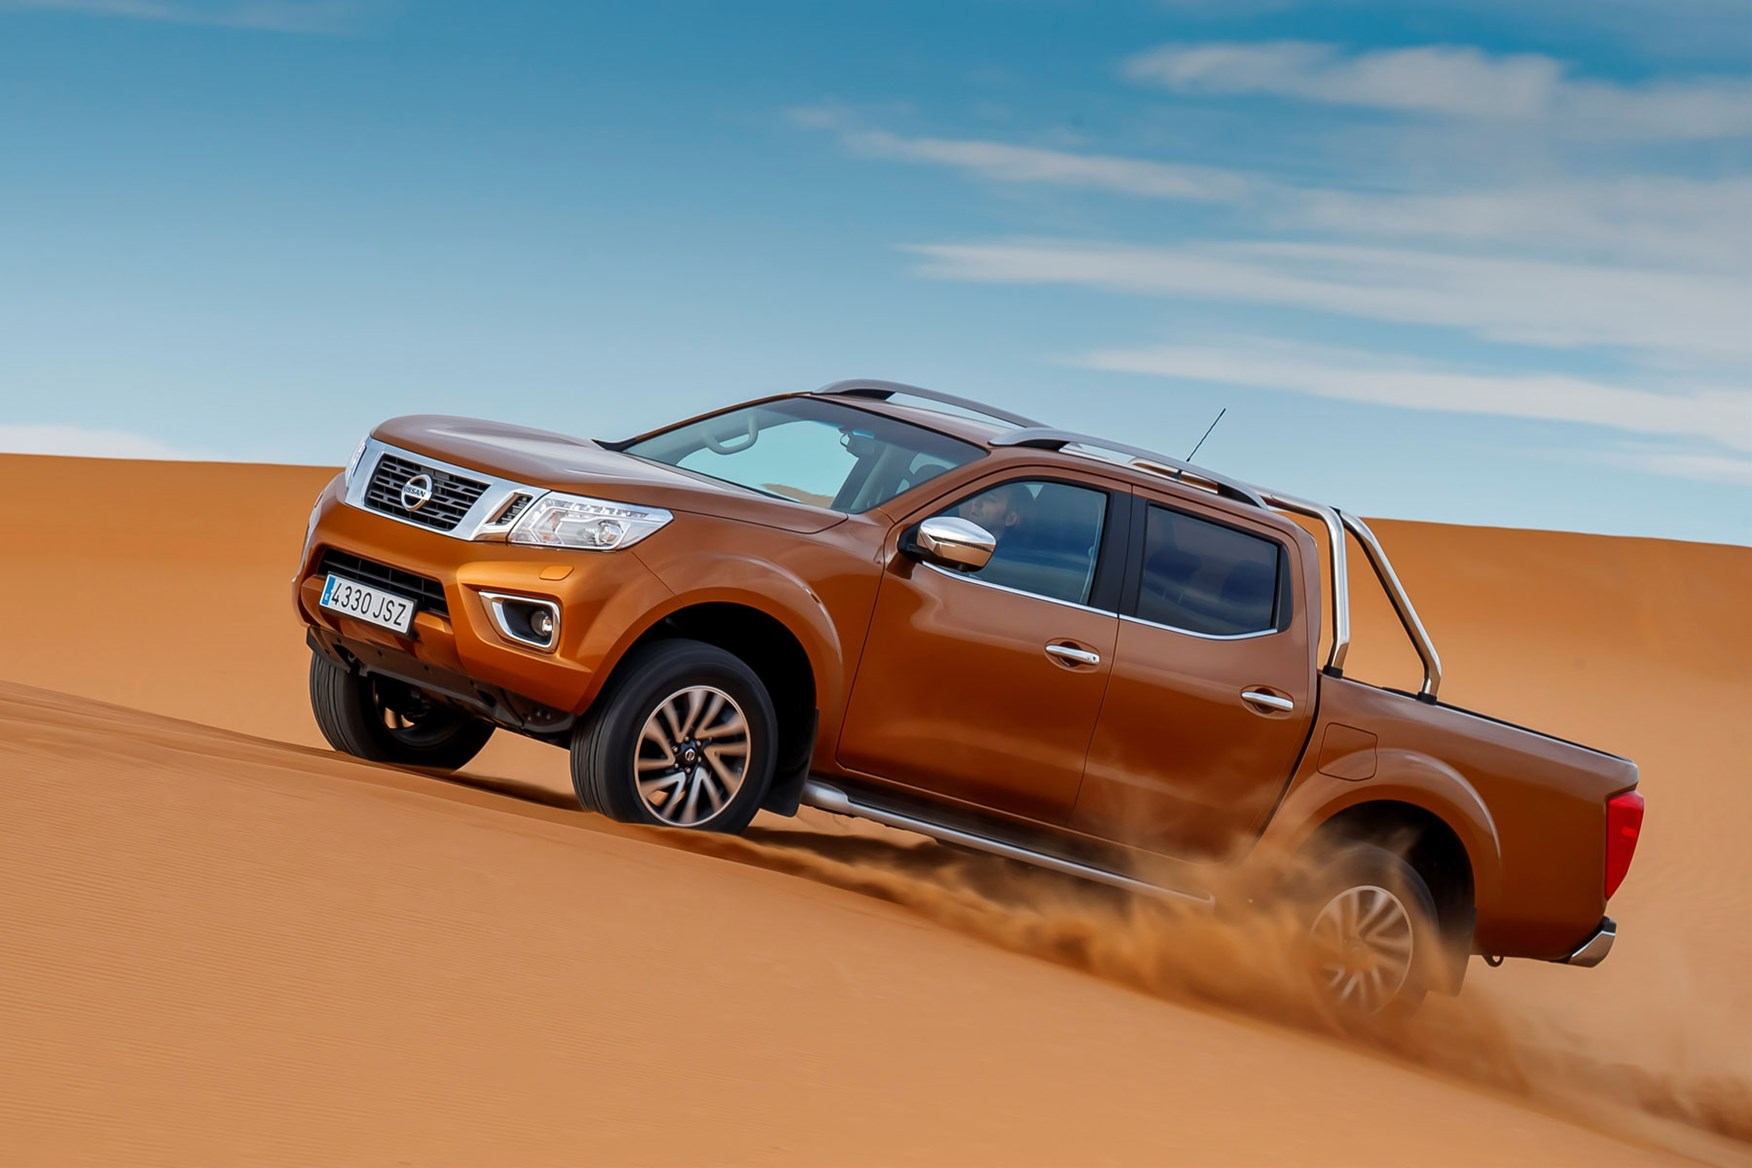 Nissan Navara Tekna review - driving in the Sahara Desert, side view, orange, climbing dune